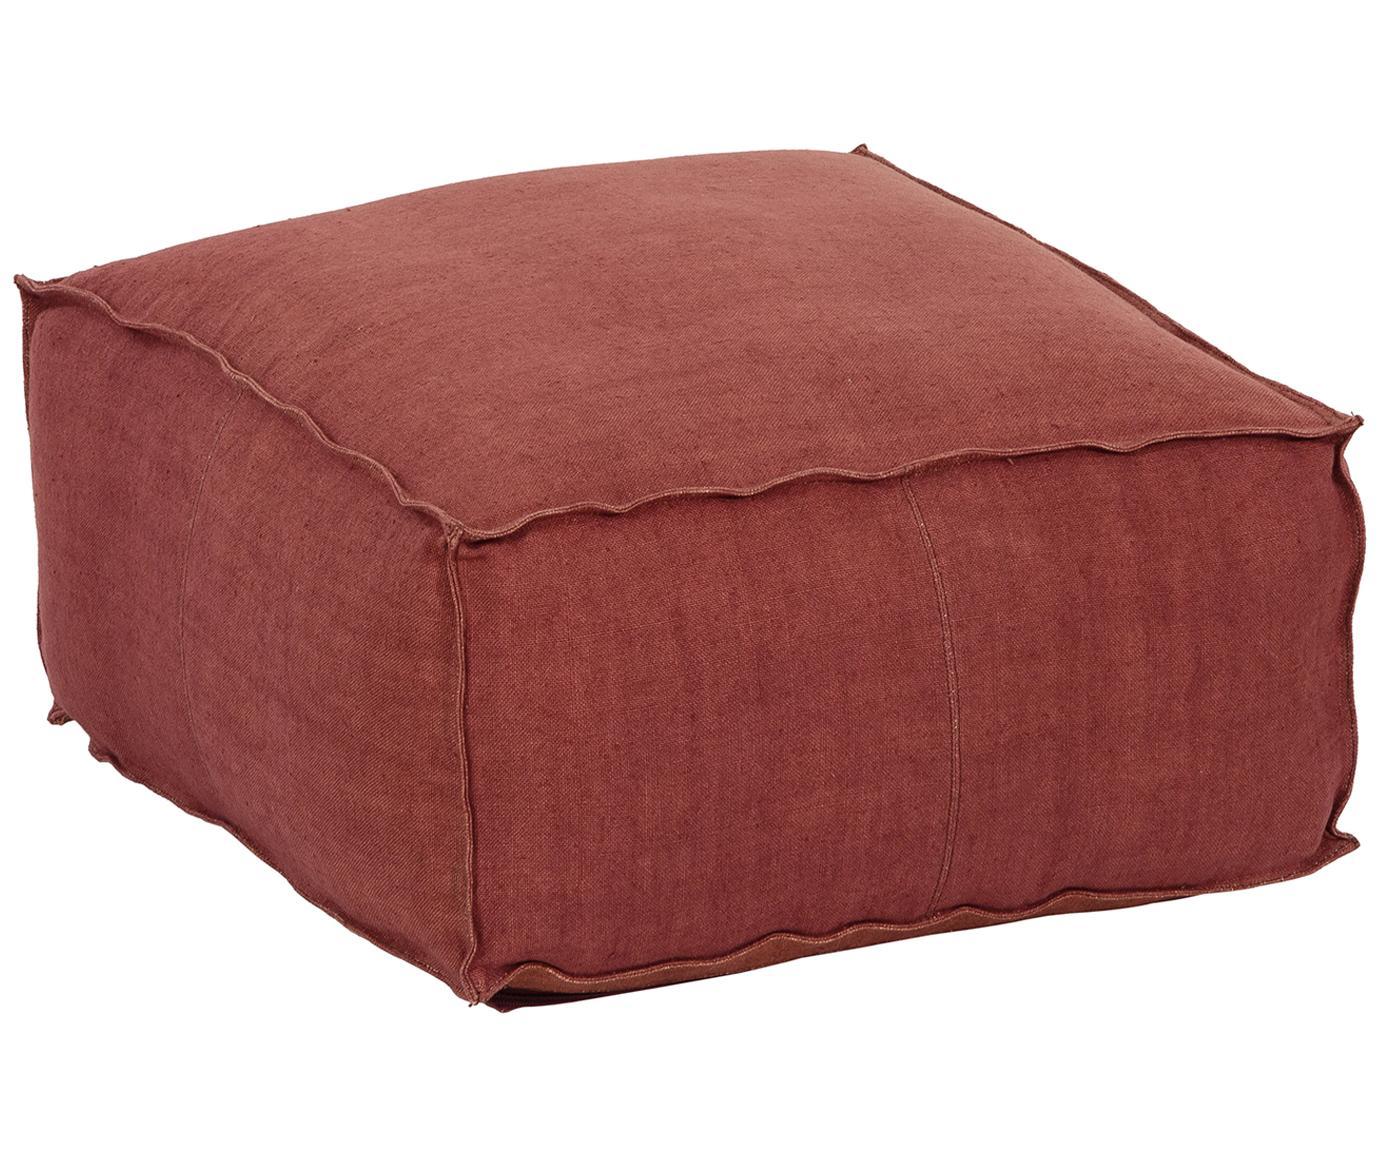 Cojín de suelo artesanal de lino Saffron, Funda: lino, Interior: algodón, Rojo cobrizo, An 50 x Al 25 cm